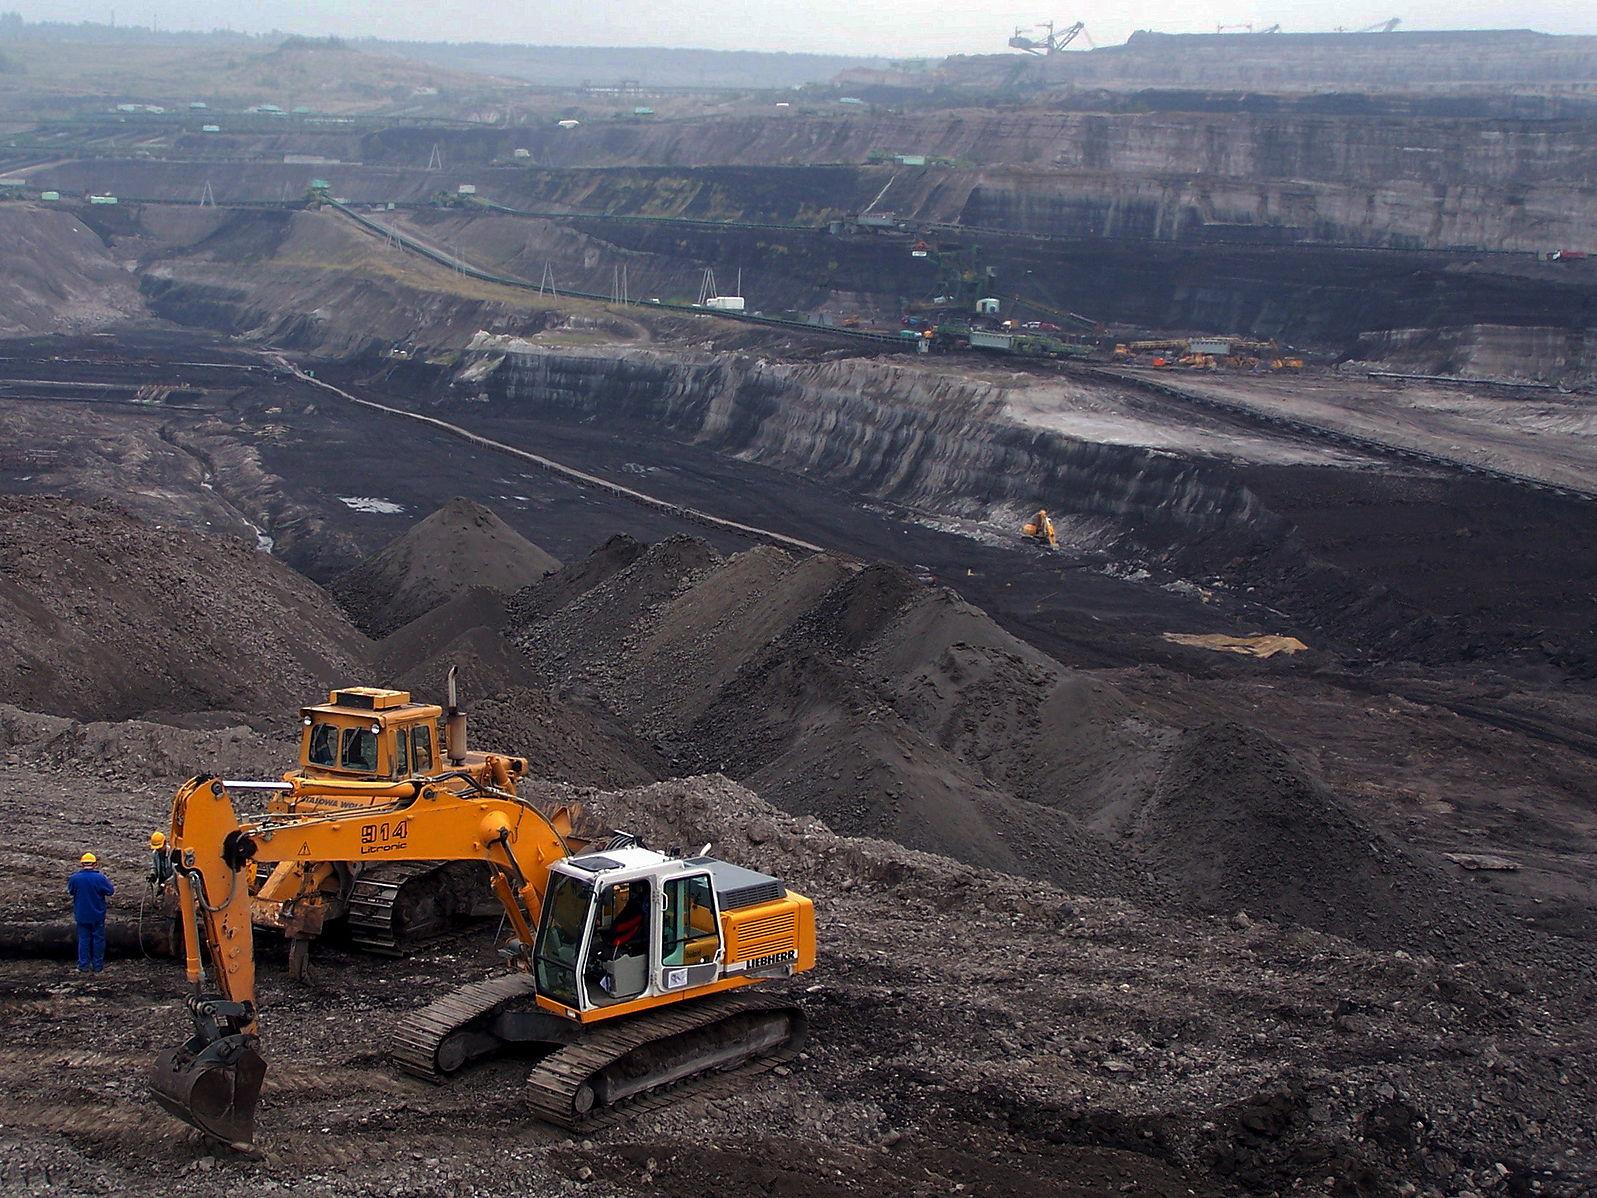 In Poland, EU Court Rules Pause for Massive Coal Mine